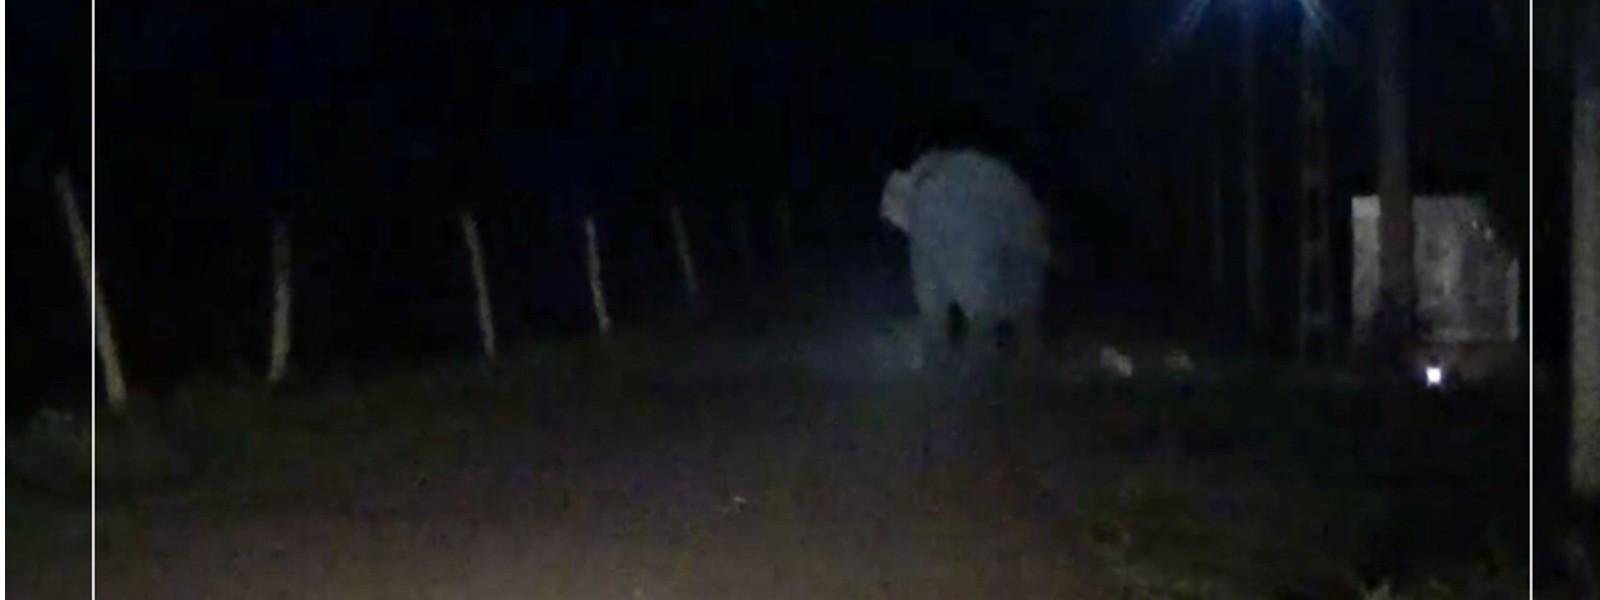 Child injured in wild elephant attack